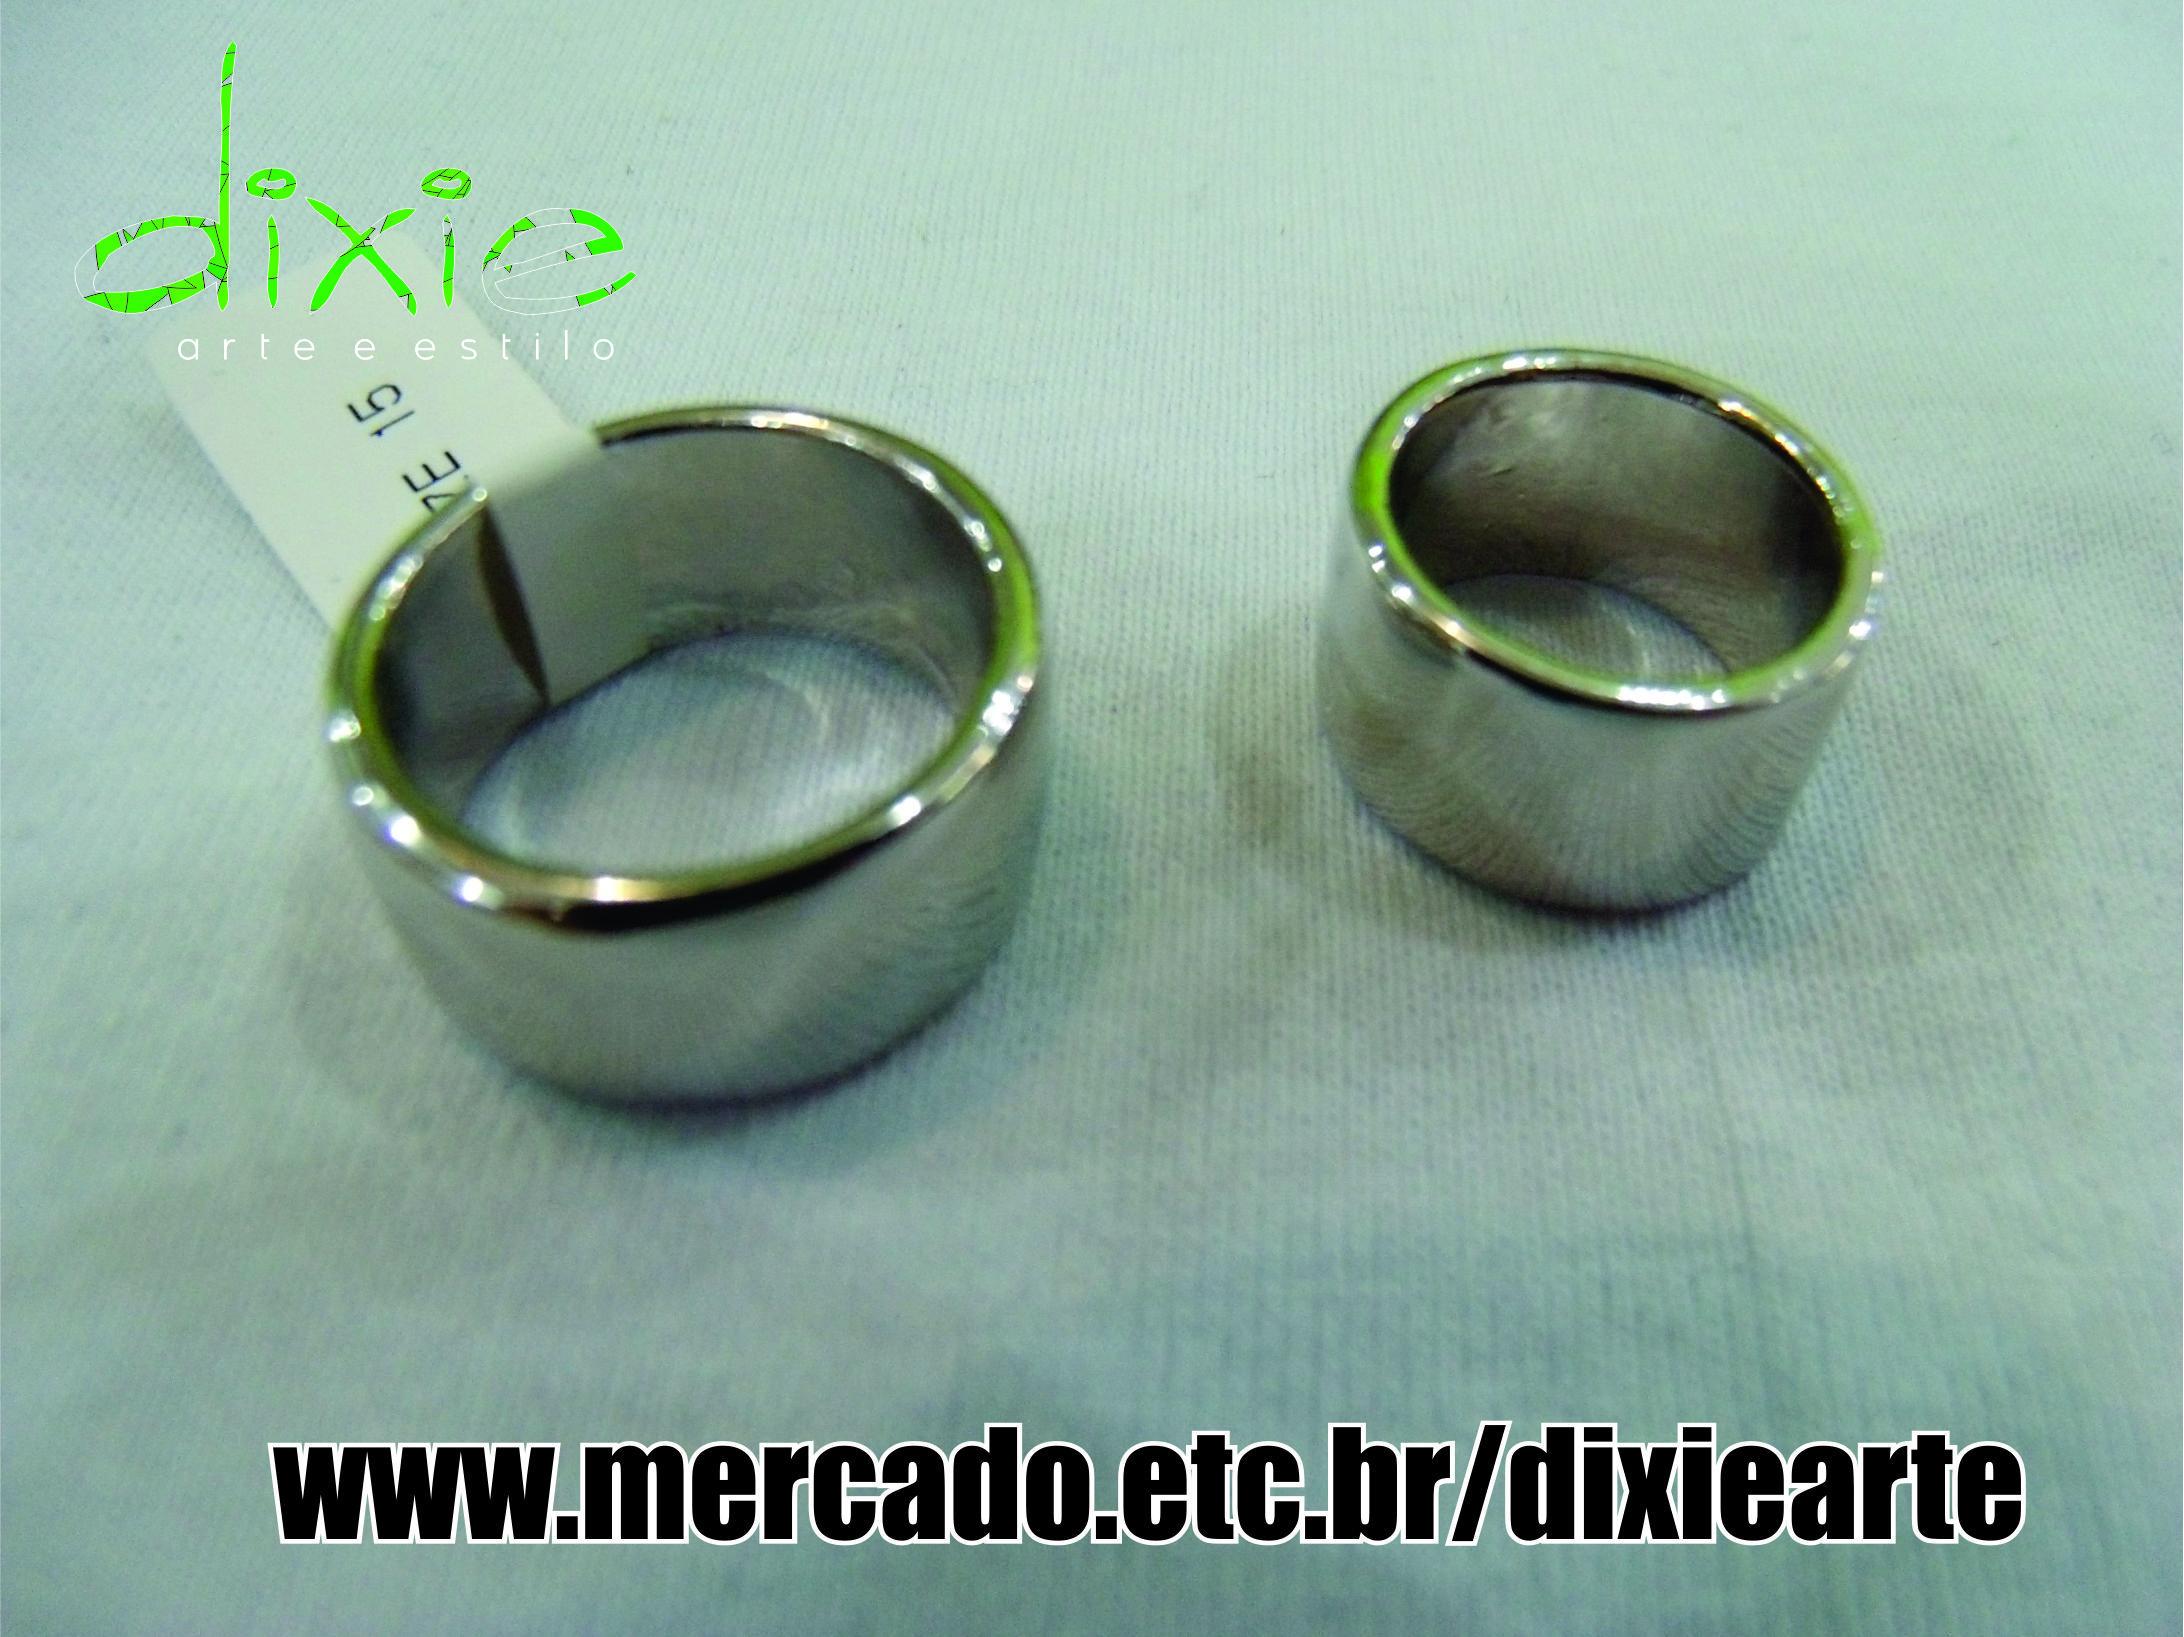 Anel Bandage Prateado  www.mercado.etc.br/dixiearte